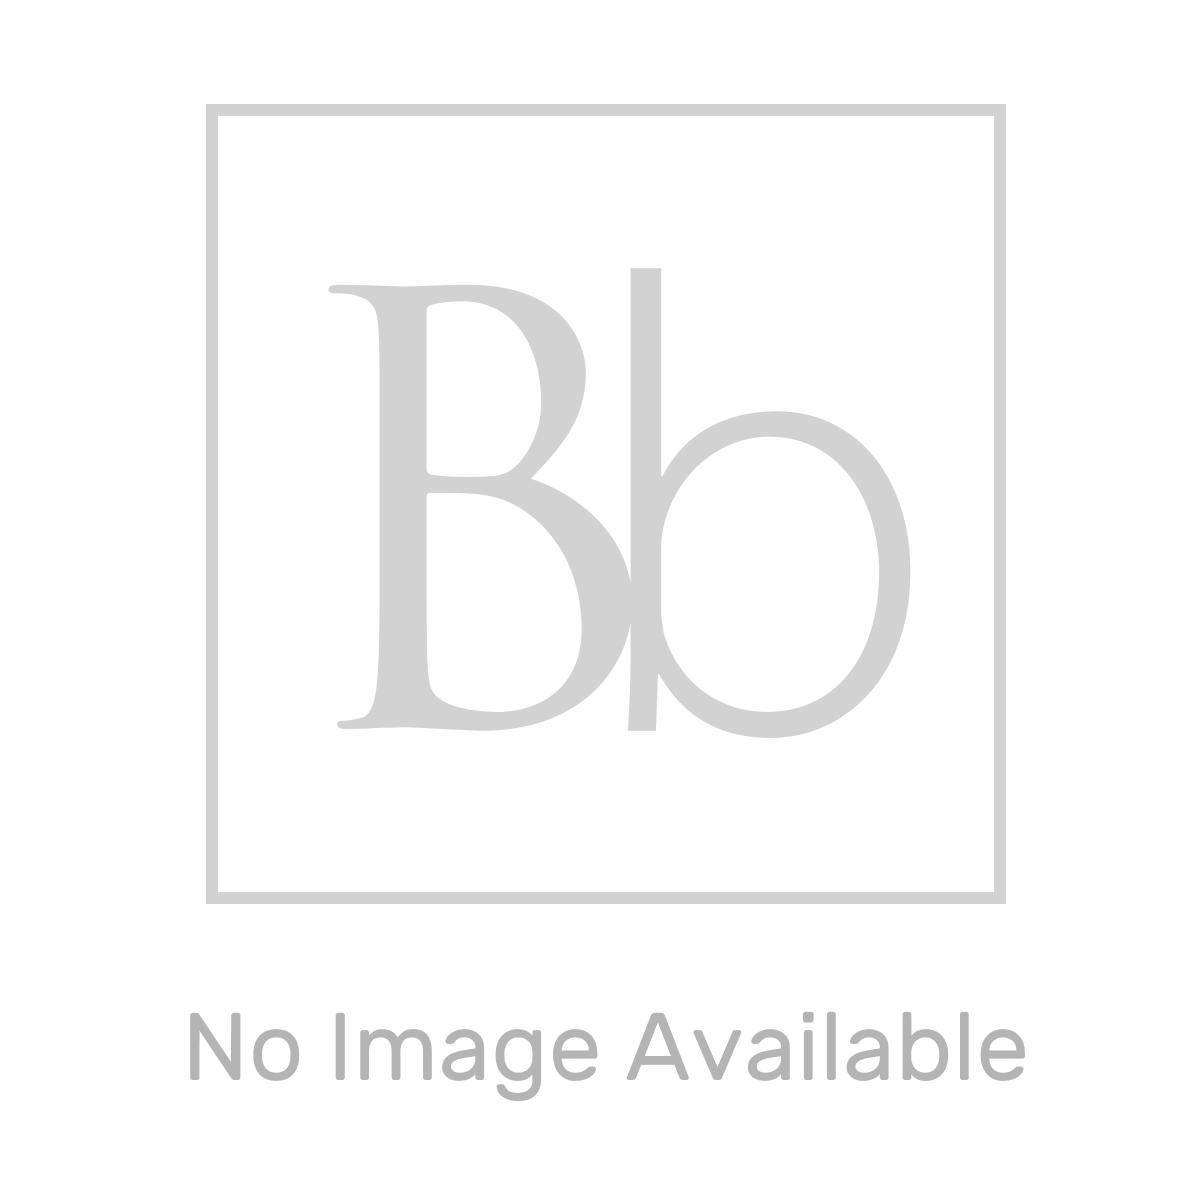 Tavistock Meridian Wood Toilet Seat in Gloss White